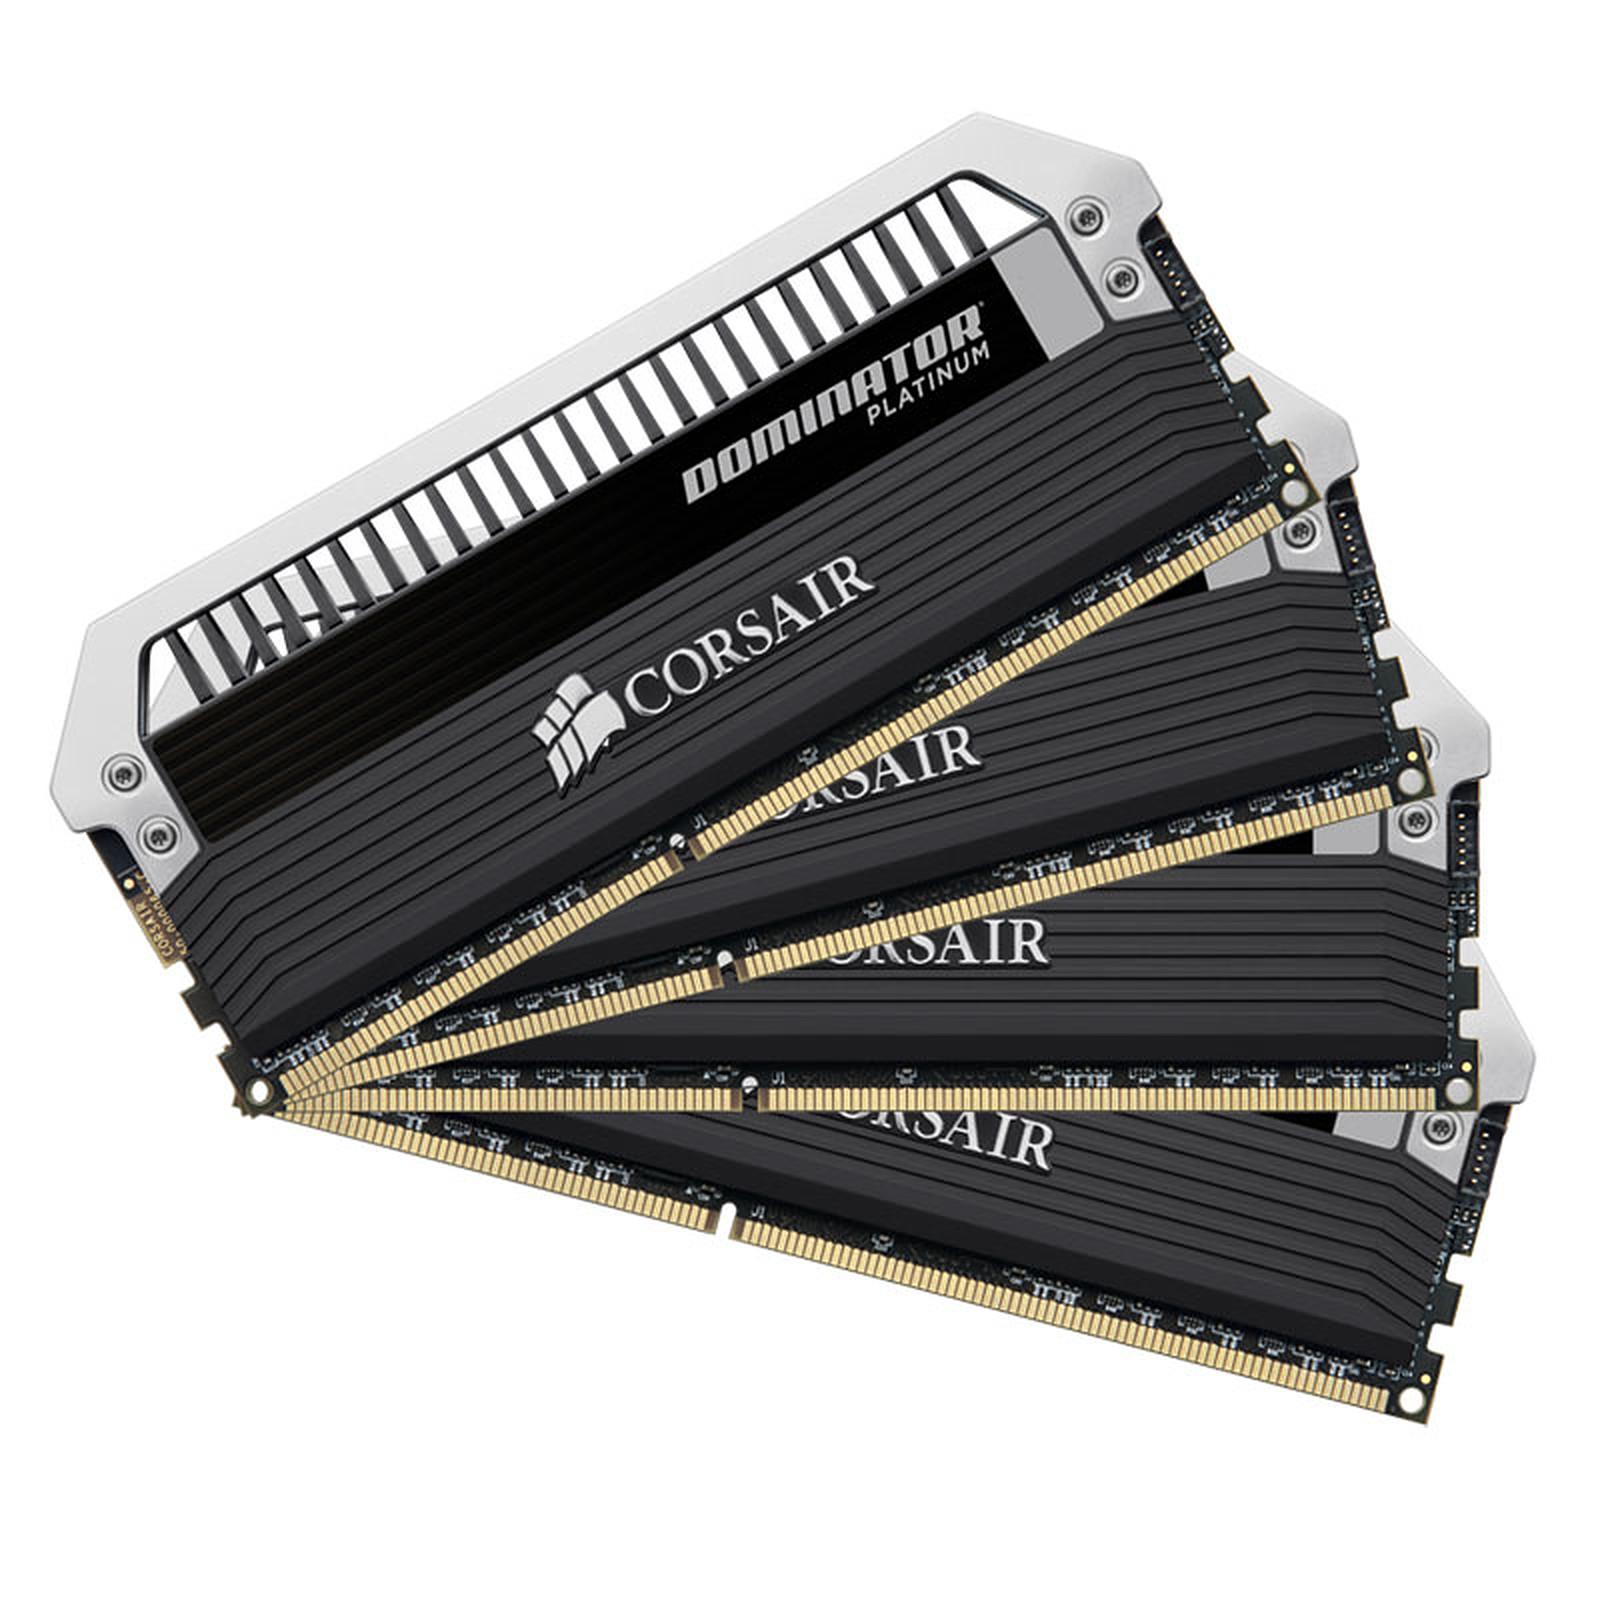 Corsair Dominator Platinum 16 Go (4 x 4Go) DDR3 2400 MHz CL11